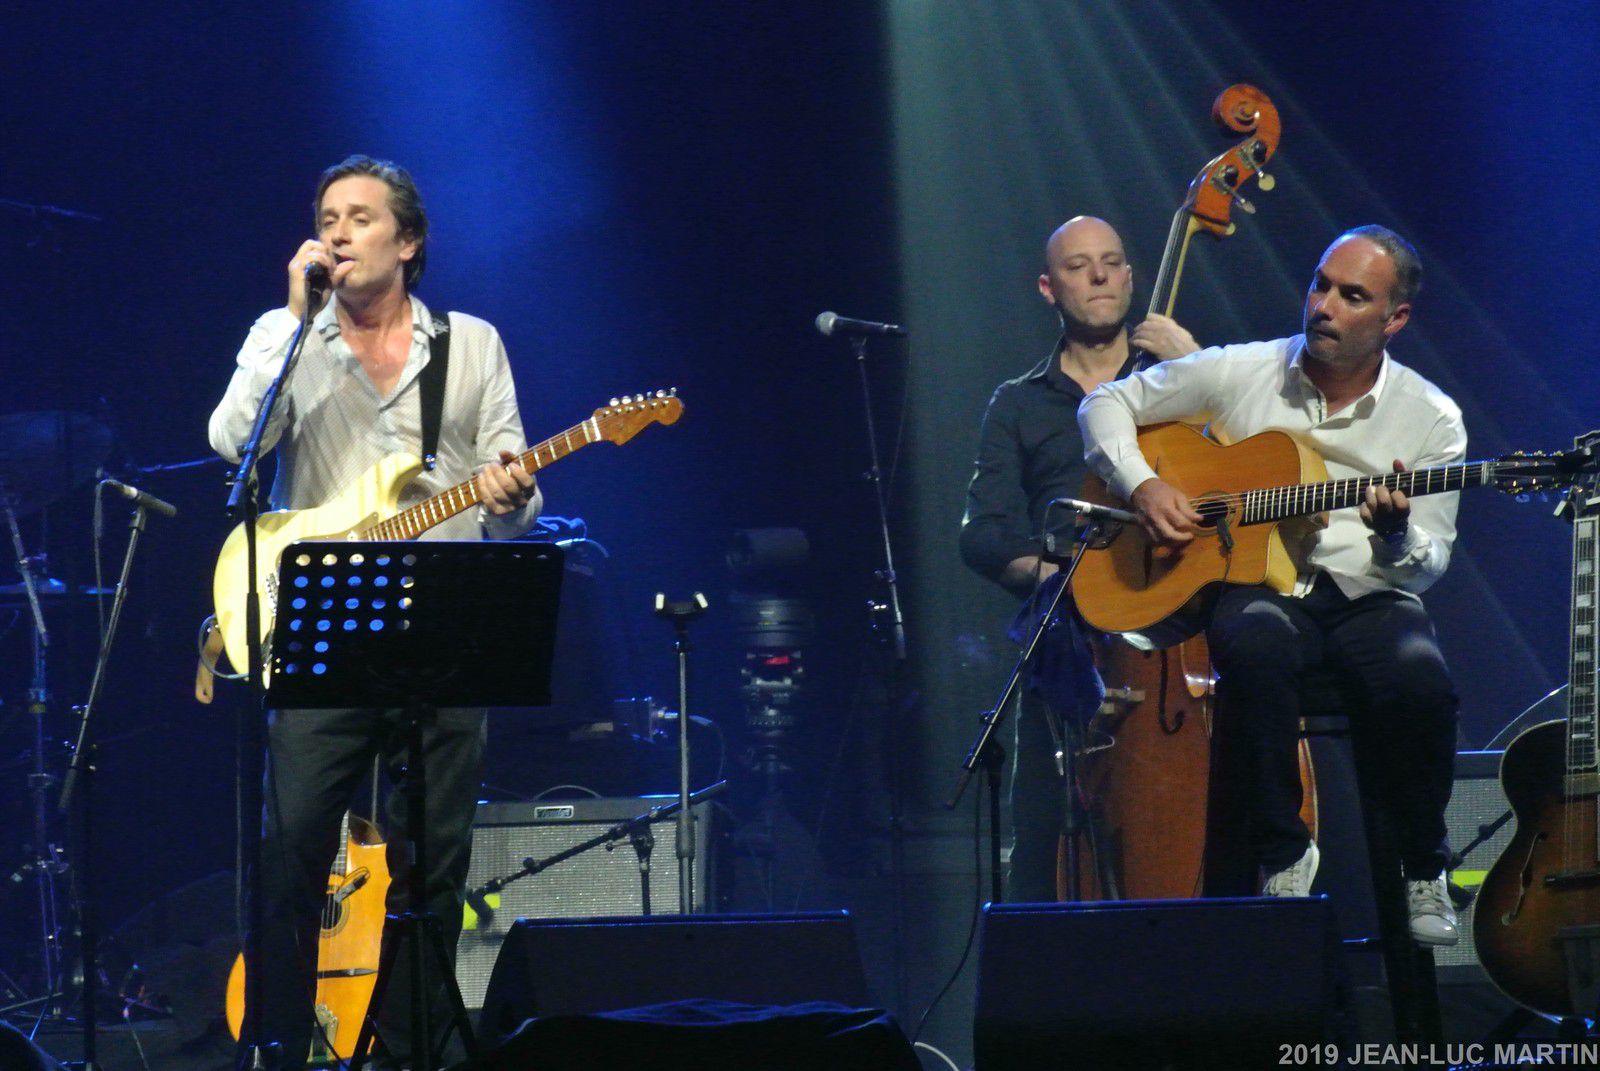 THOMAS DUTRONC: DISQUE D'OR POUR SON ALBUM FRENCHY